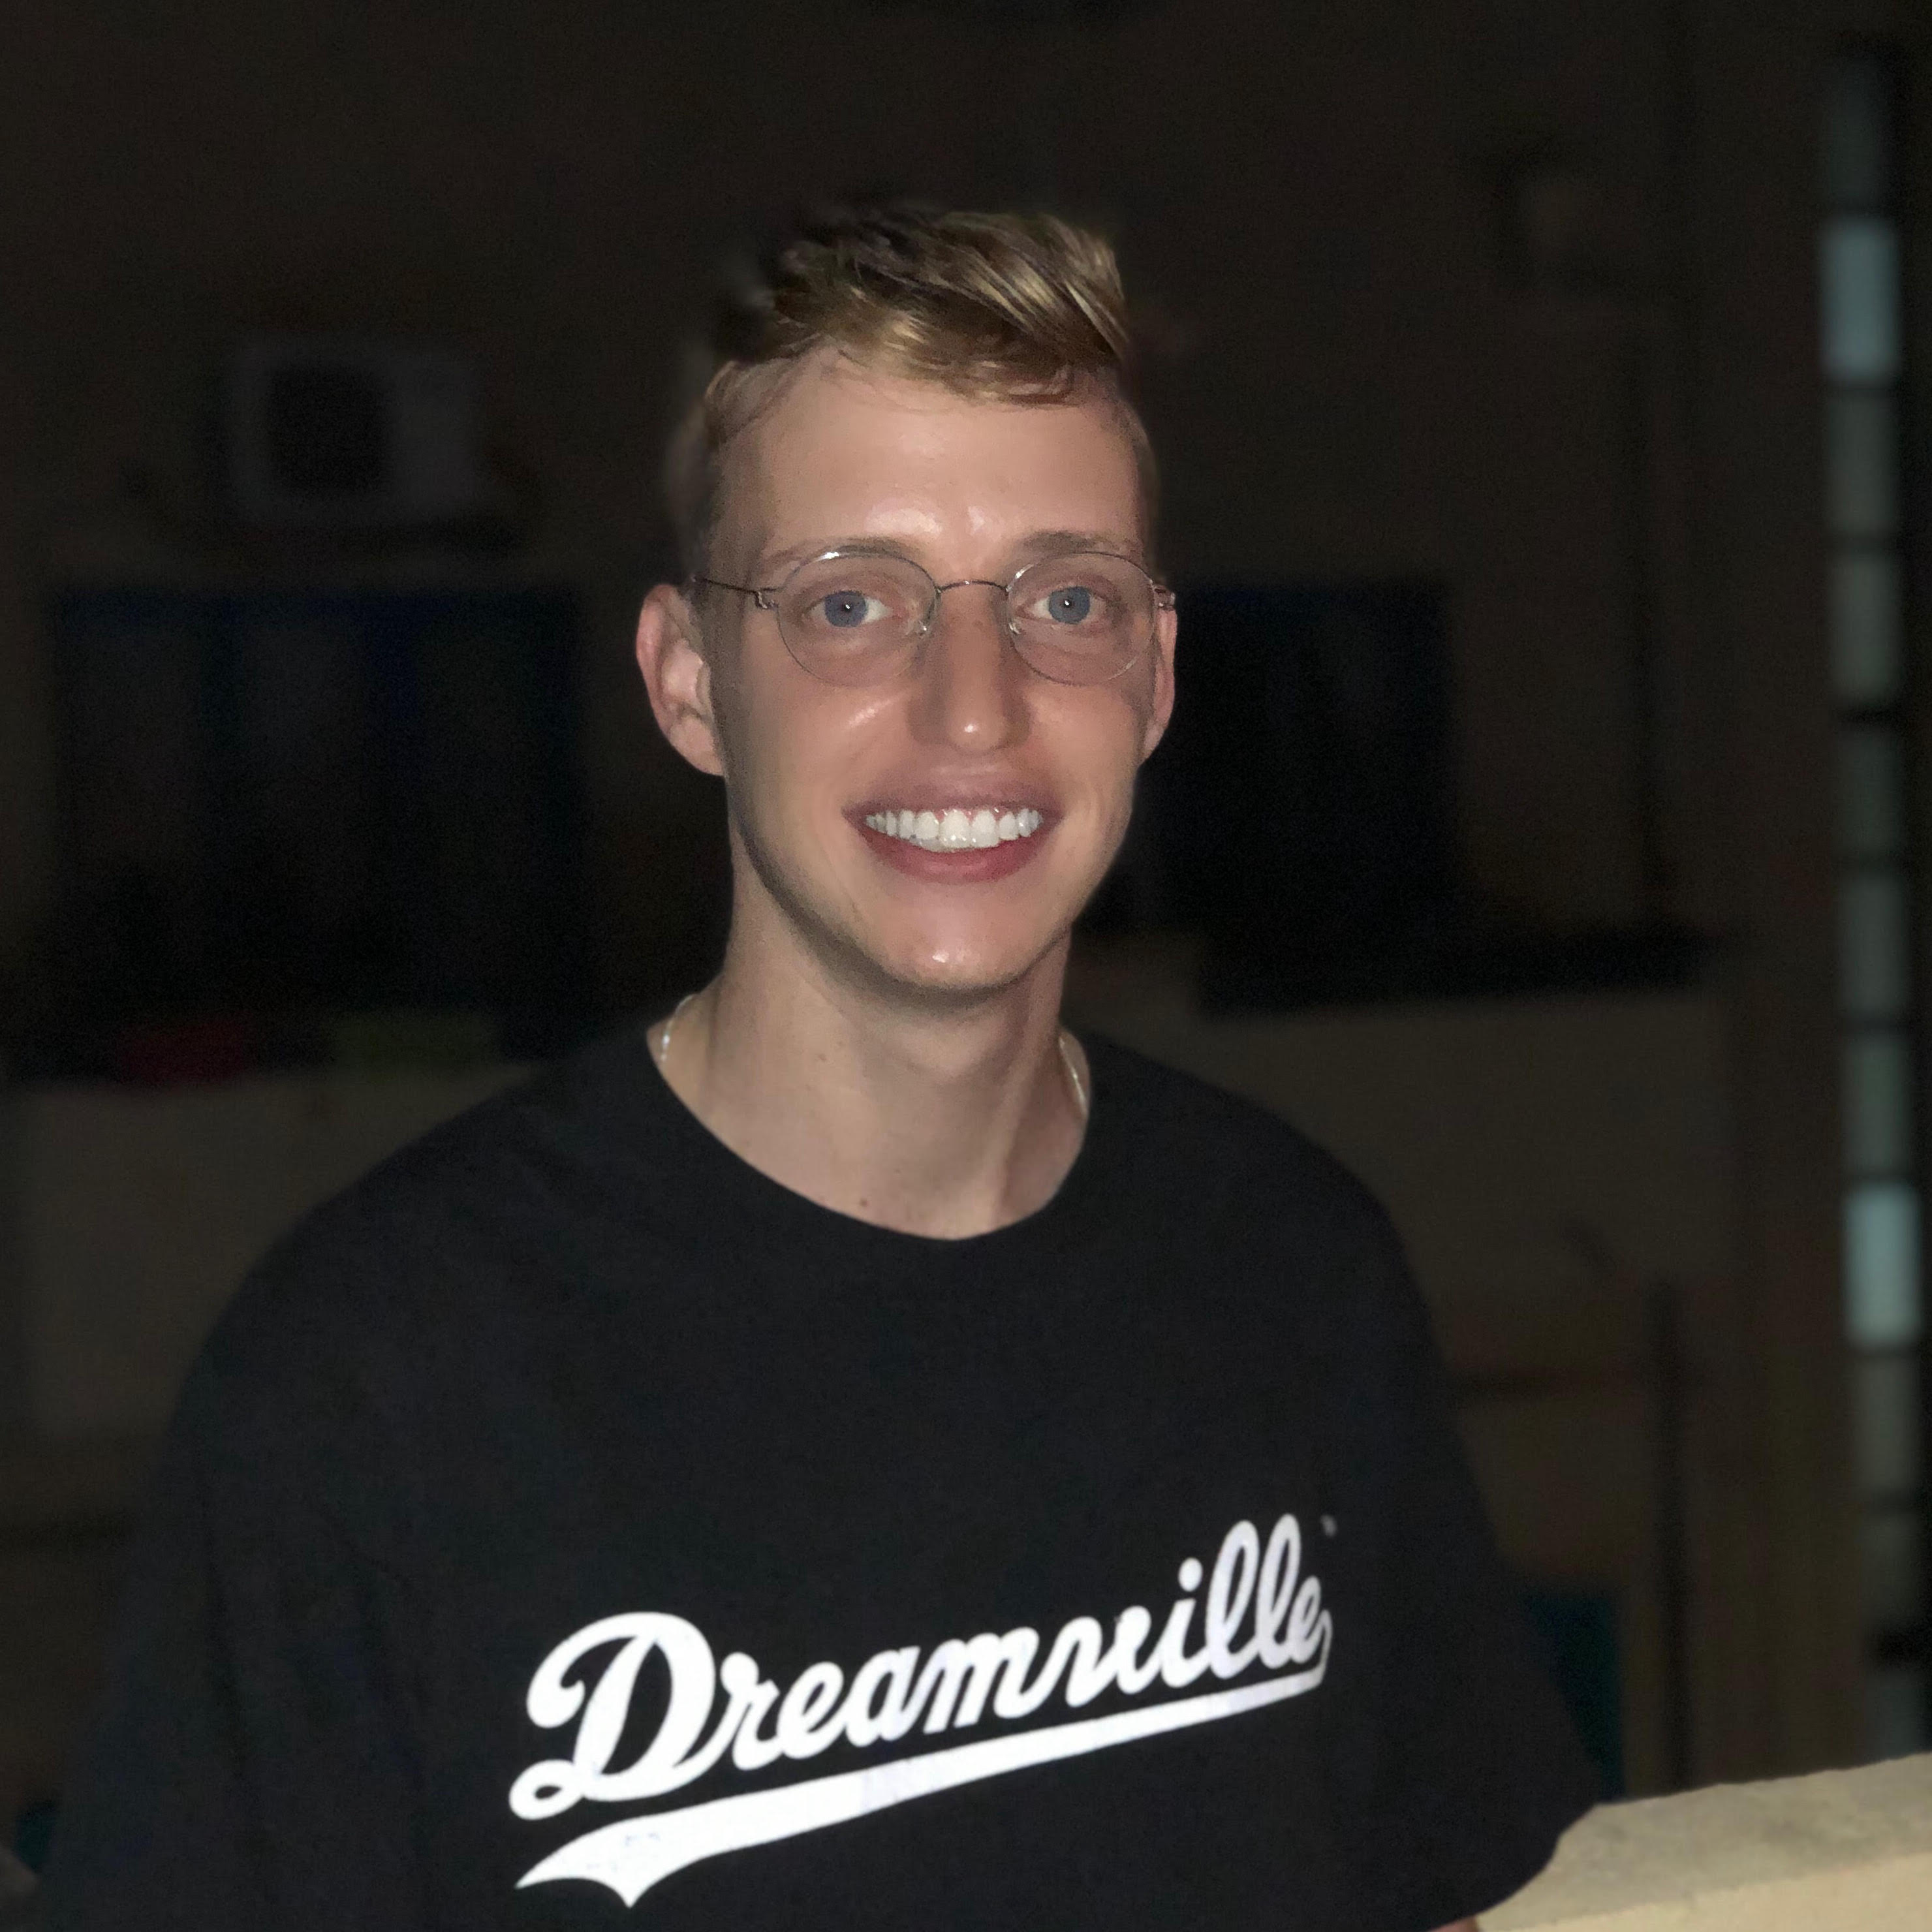 Daniel Mandelbaum